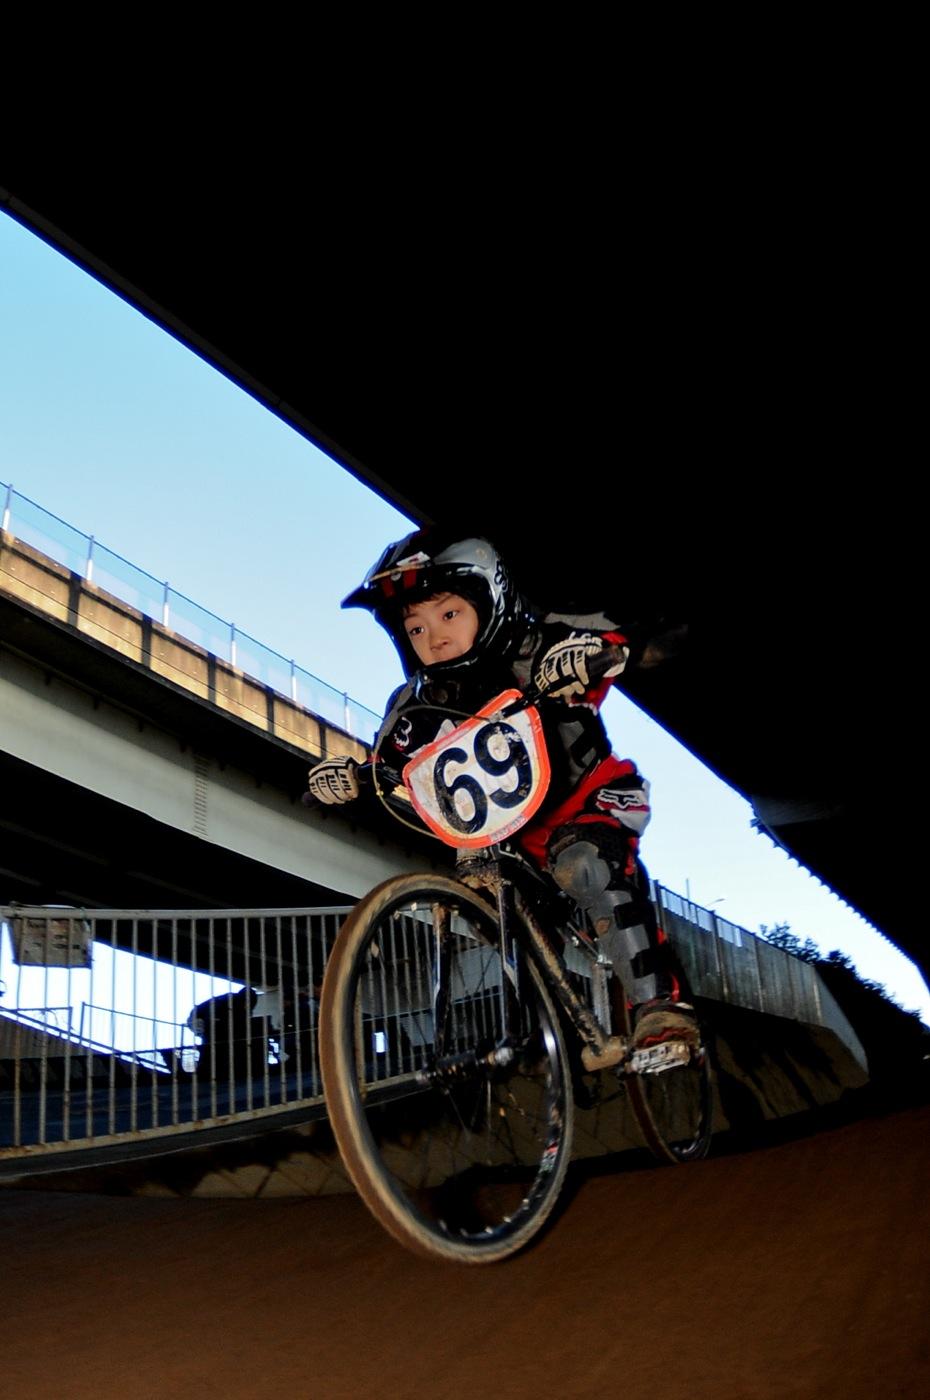 2009JOSF川口ゴリラ公園12月定期戦VOL9:コース外の風景..._b0065730_2048368.jpg